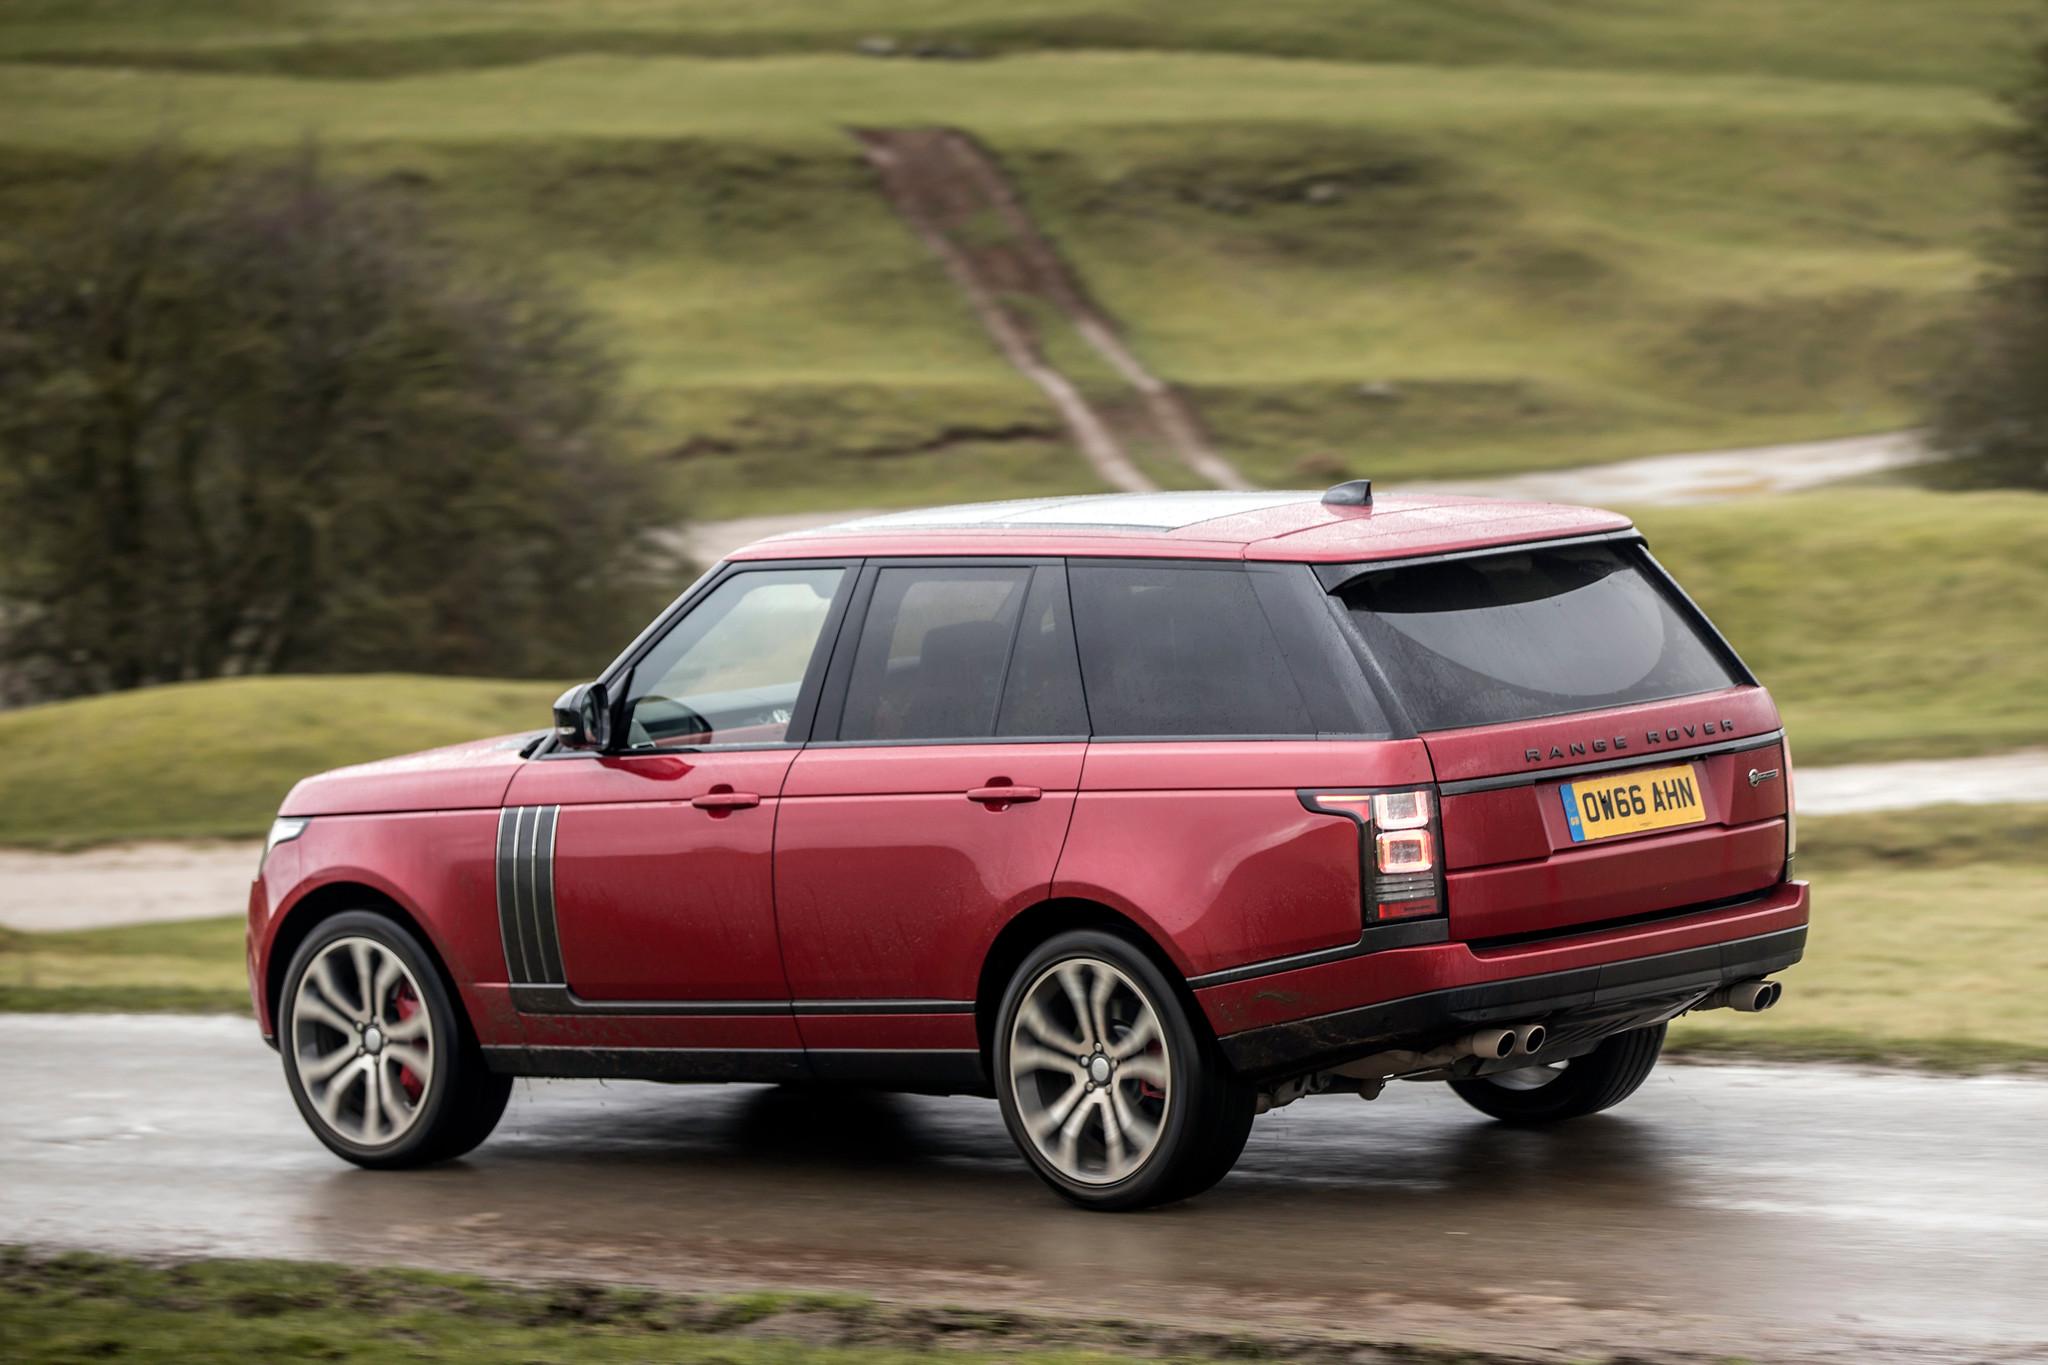 new 2017 range rover first impressions wheels alive. Black Bedroom Furniture Sets. Home Design Ideas